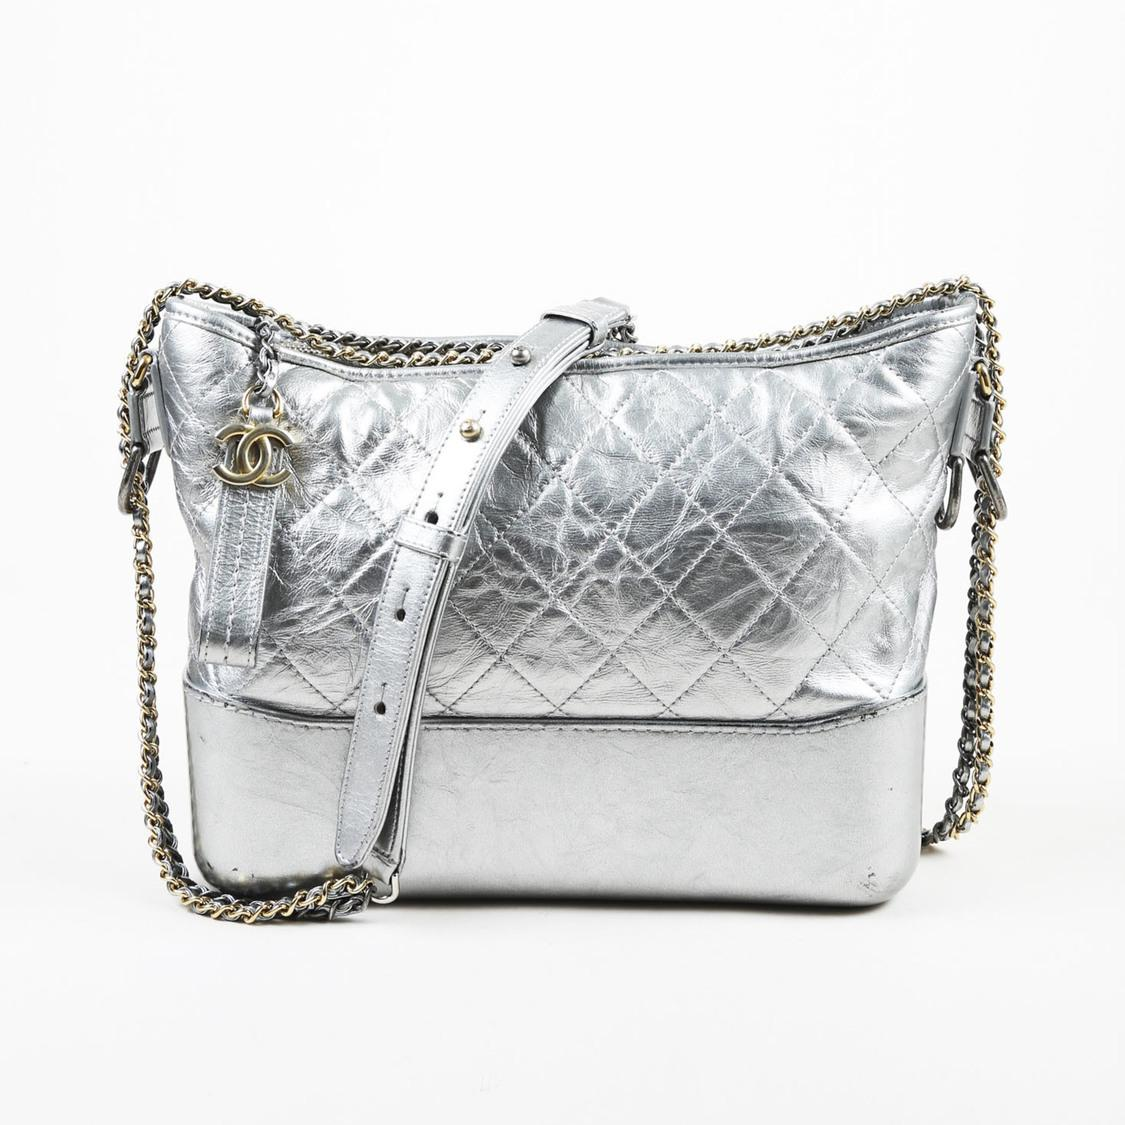 cc687d543e17 Chanel. Women's Metallic Silver Lambskin Medium